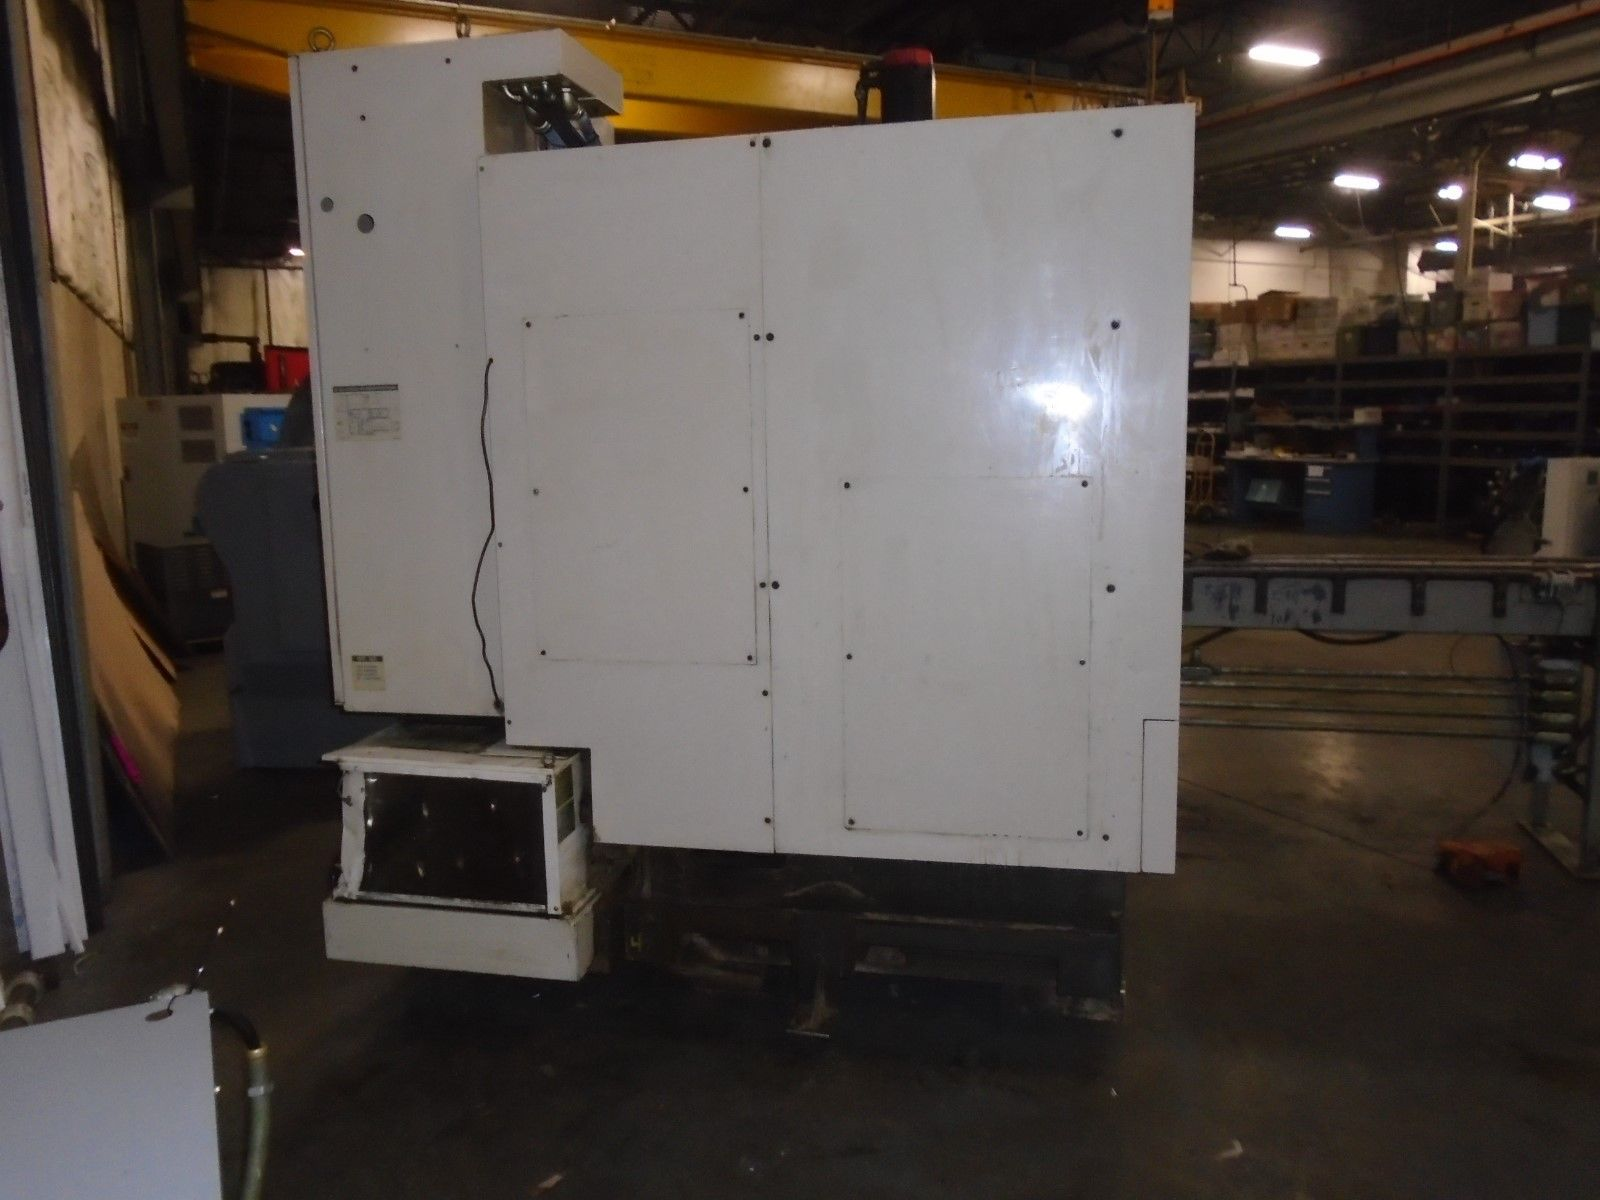 Hitachi Seiki CS20 Vertical CNC Lathe 10L Seicos Control 1998 - Image 4 of 12